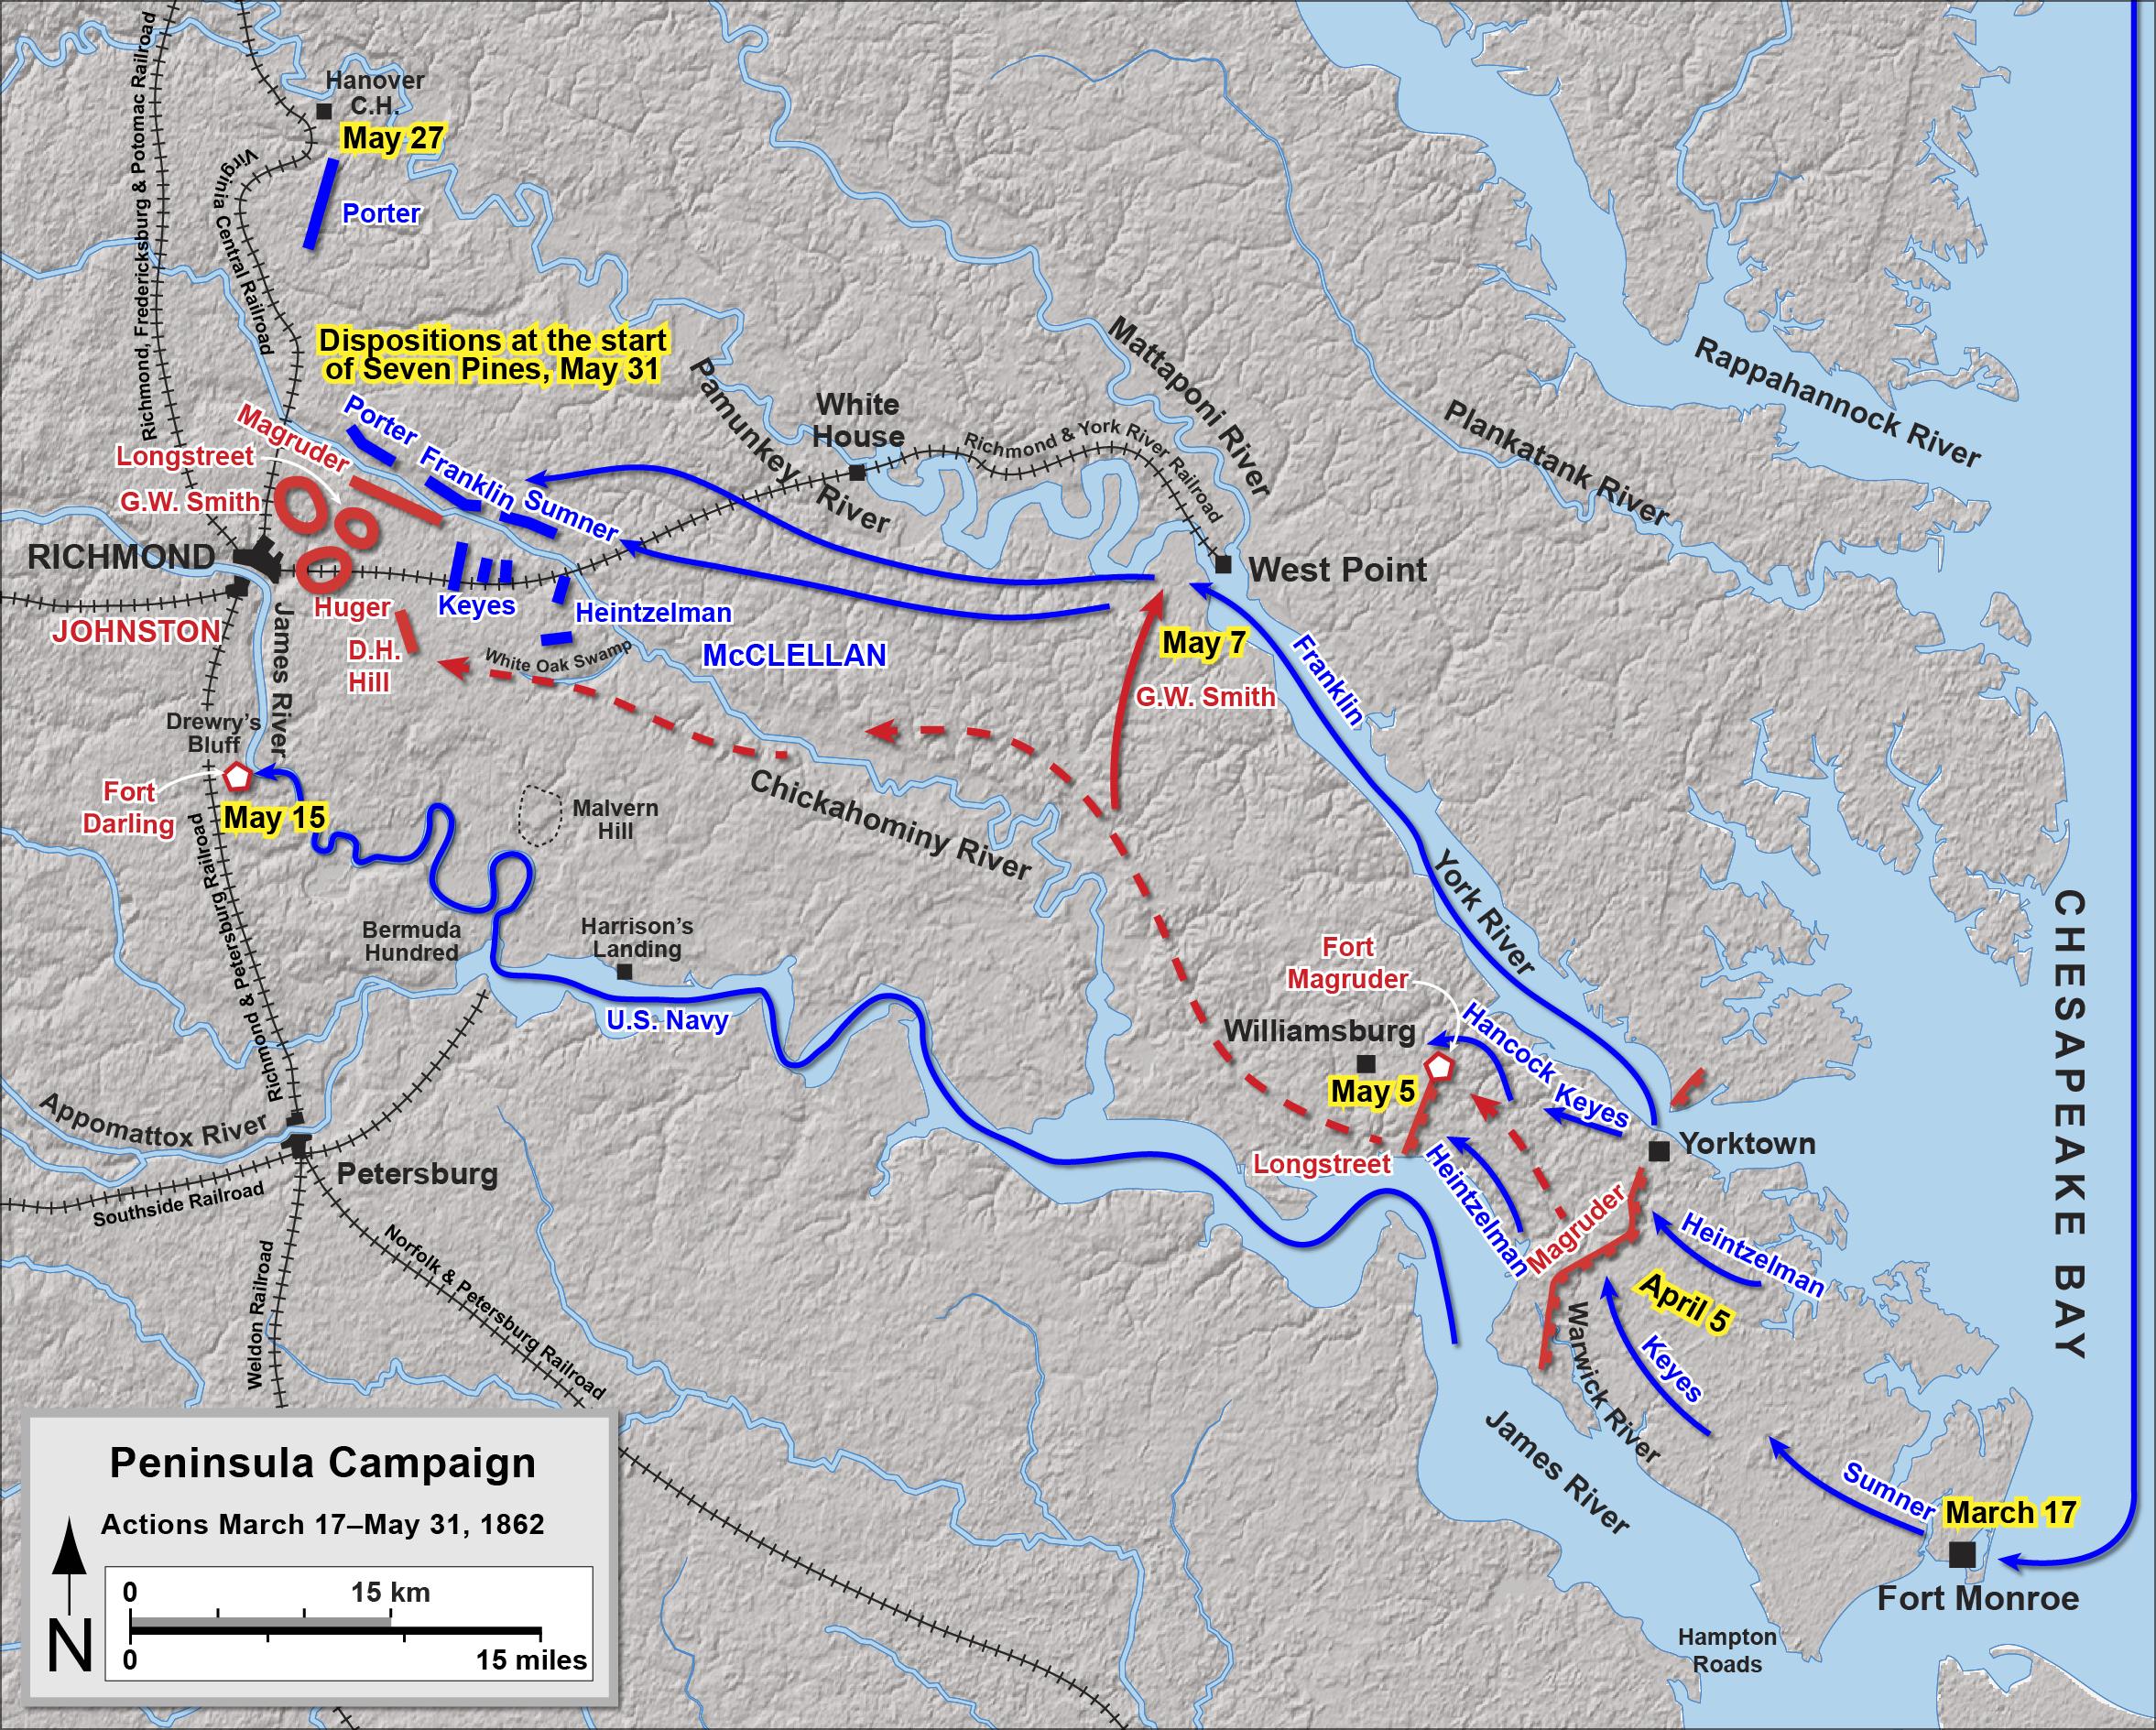 37 maps that explain the American Civil War - Vox